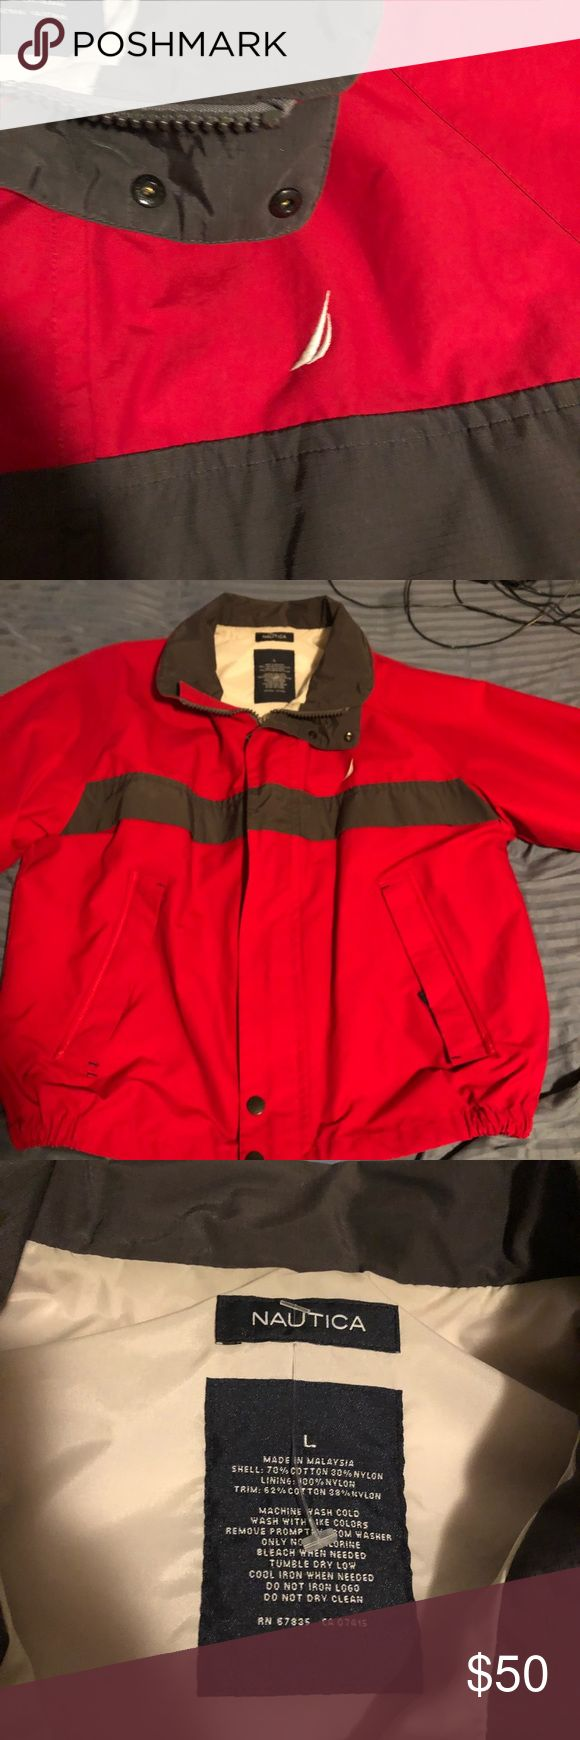 Vintage Nautica Jacket GOOD CONDITION, CHEAP PRICE, VINTAGE Nautica Jackets & Coats Windbreakers